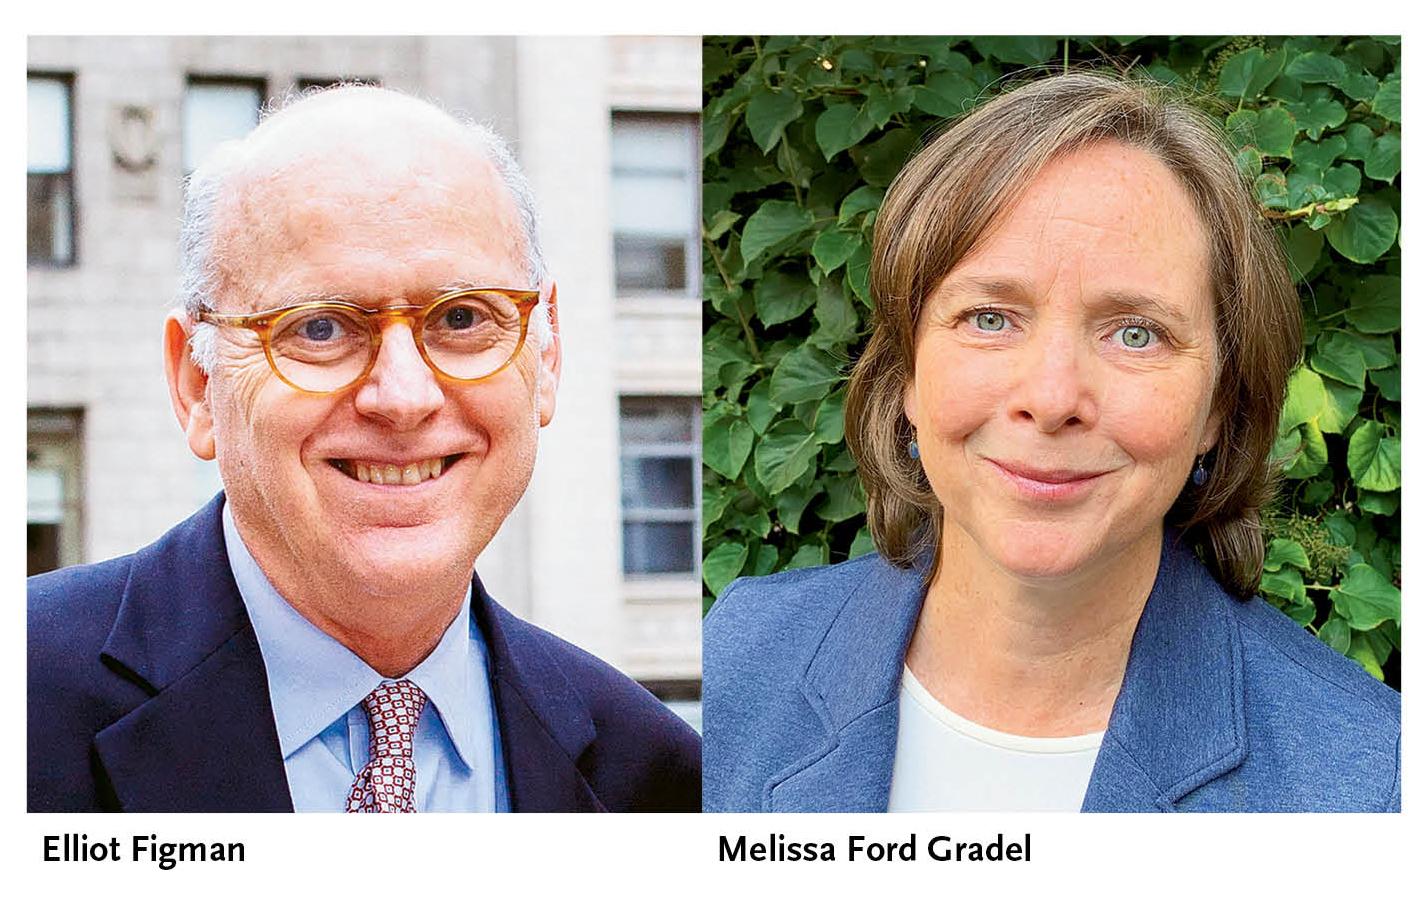 Elliot Figman and Melissa Ford Gradel